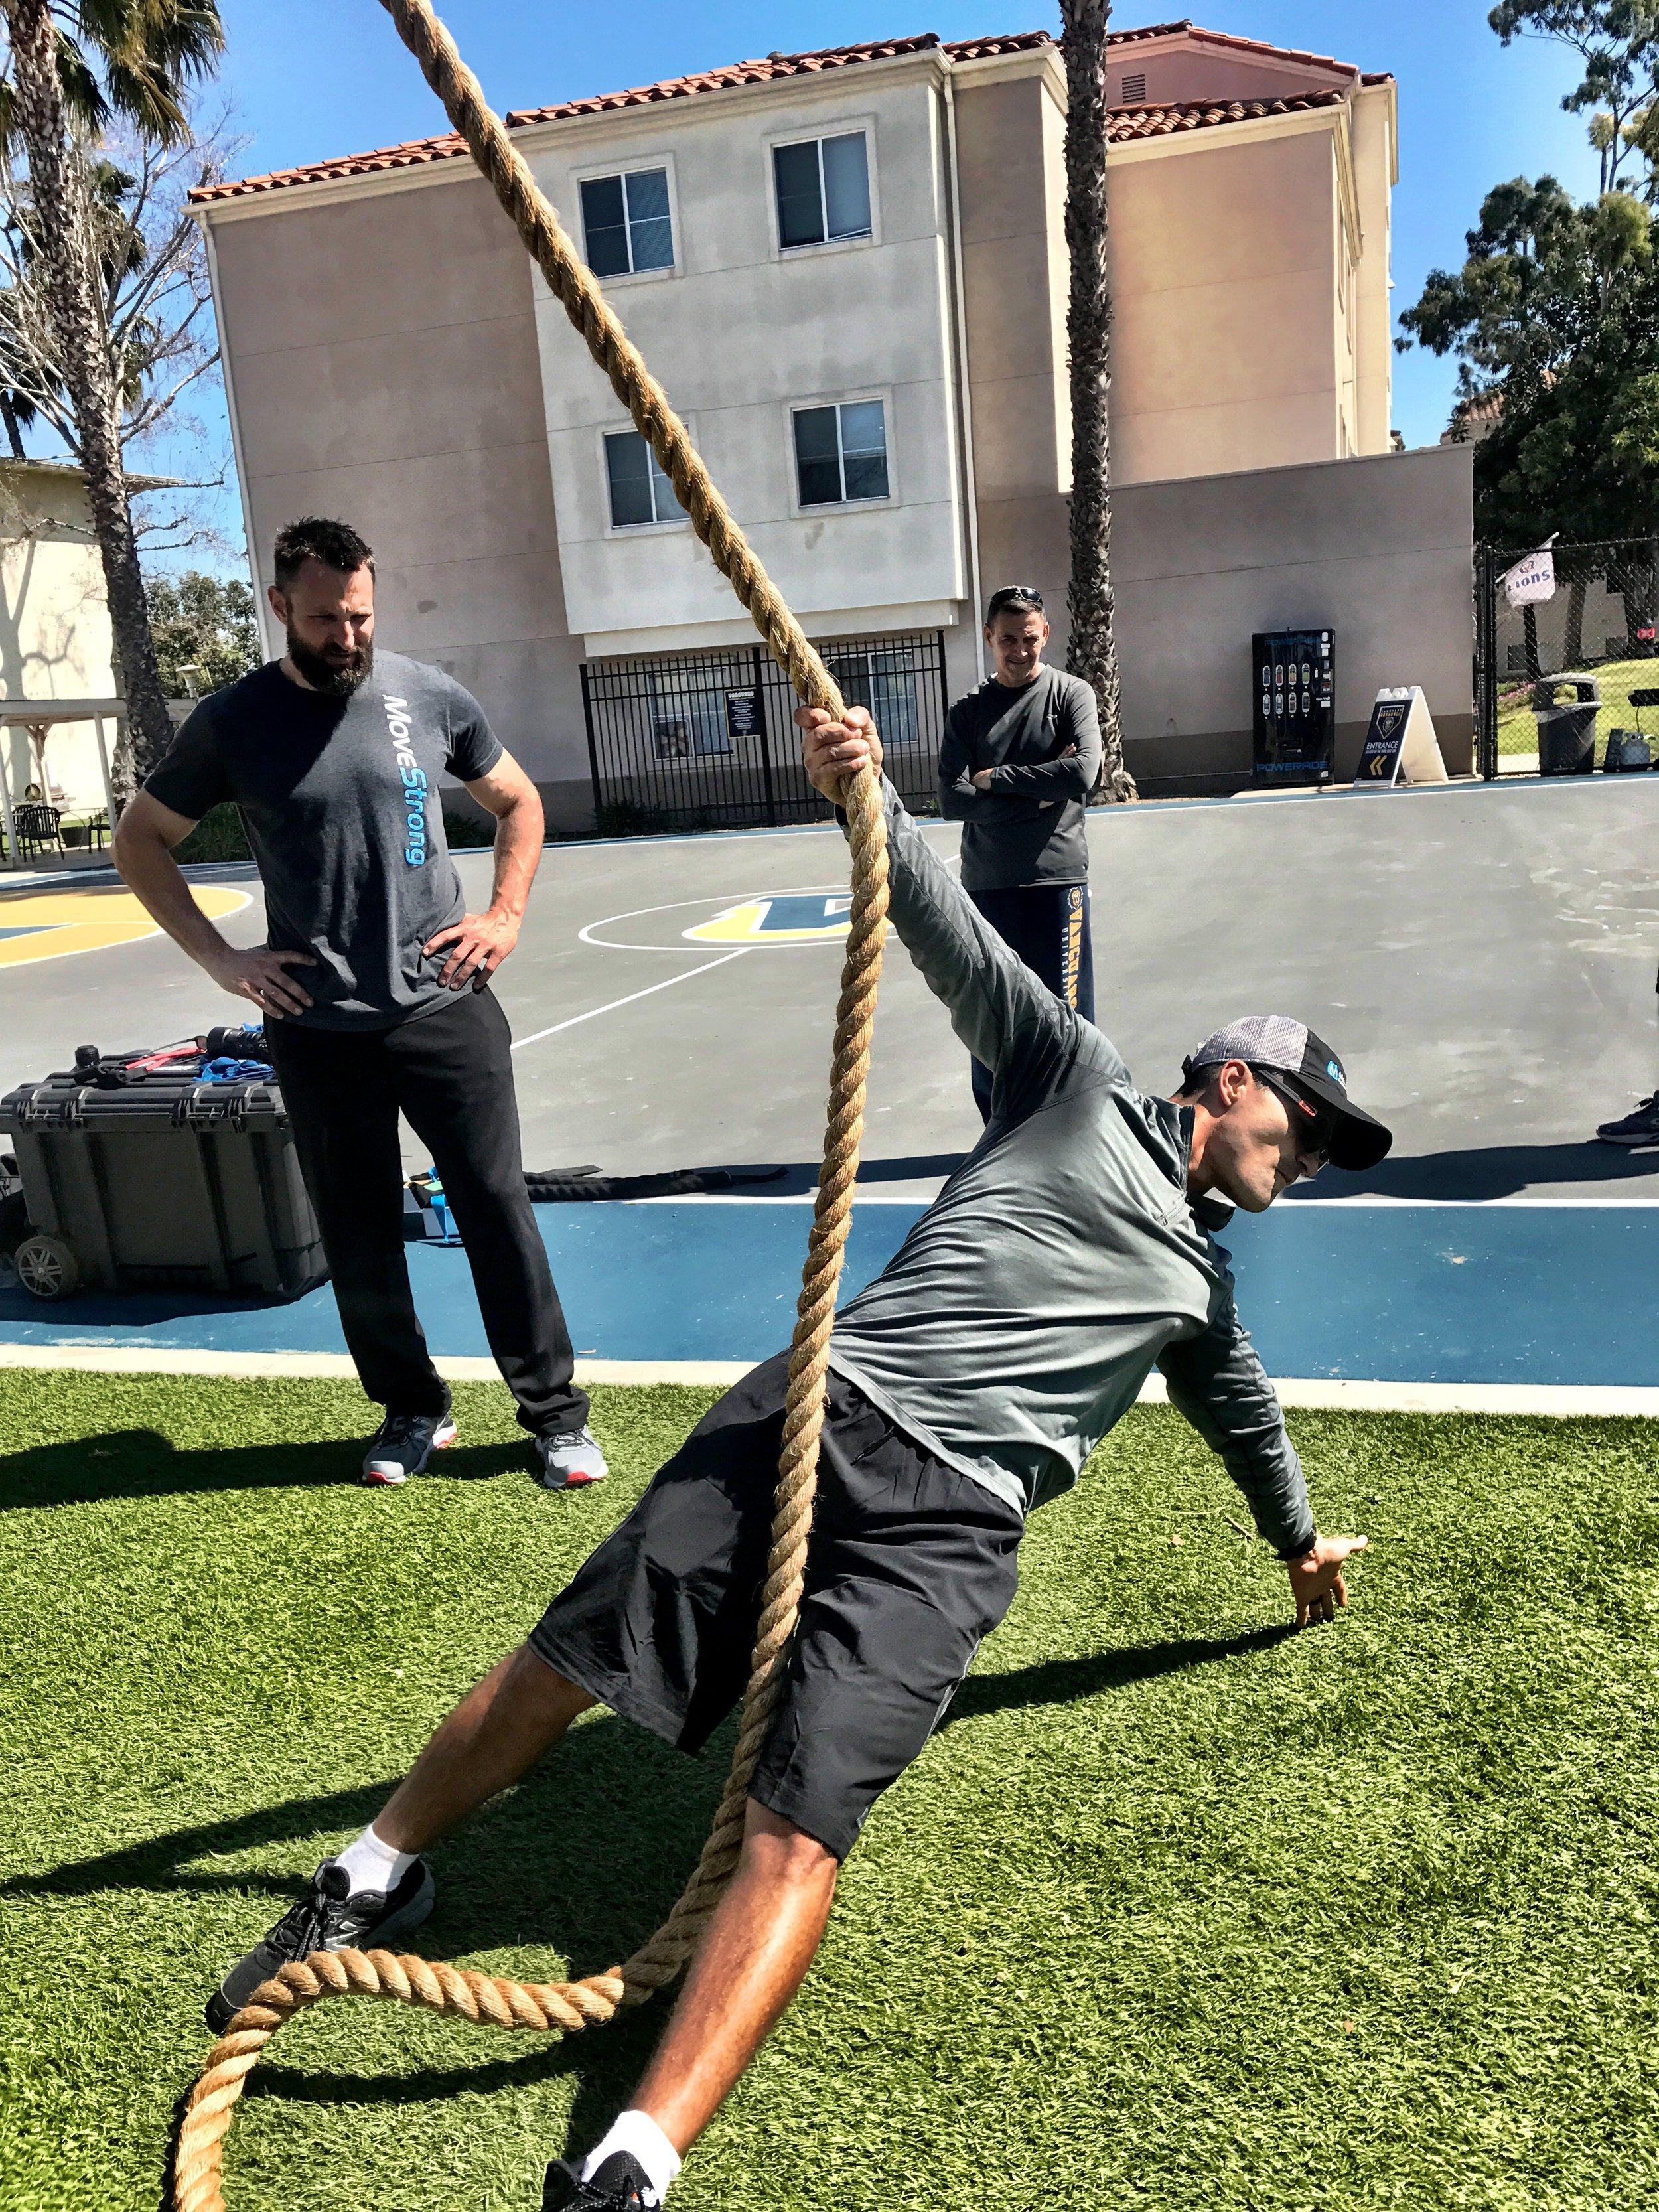 Climbing rope reach backs